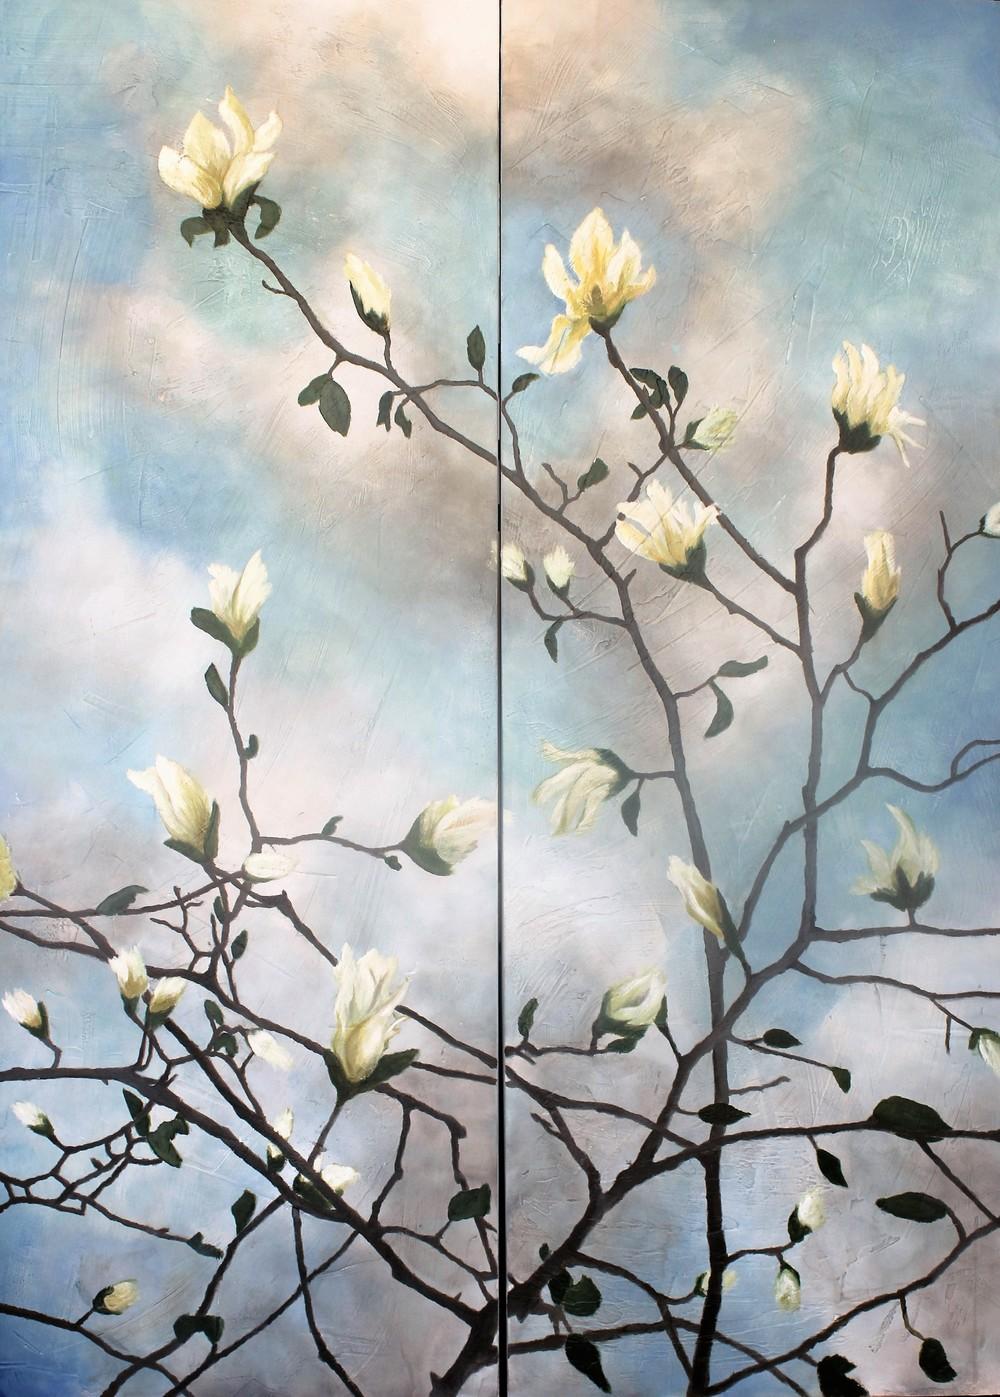 magnolia diptych 1 (3).jpg